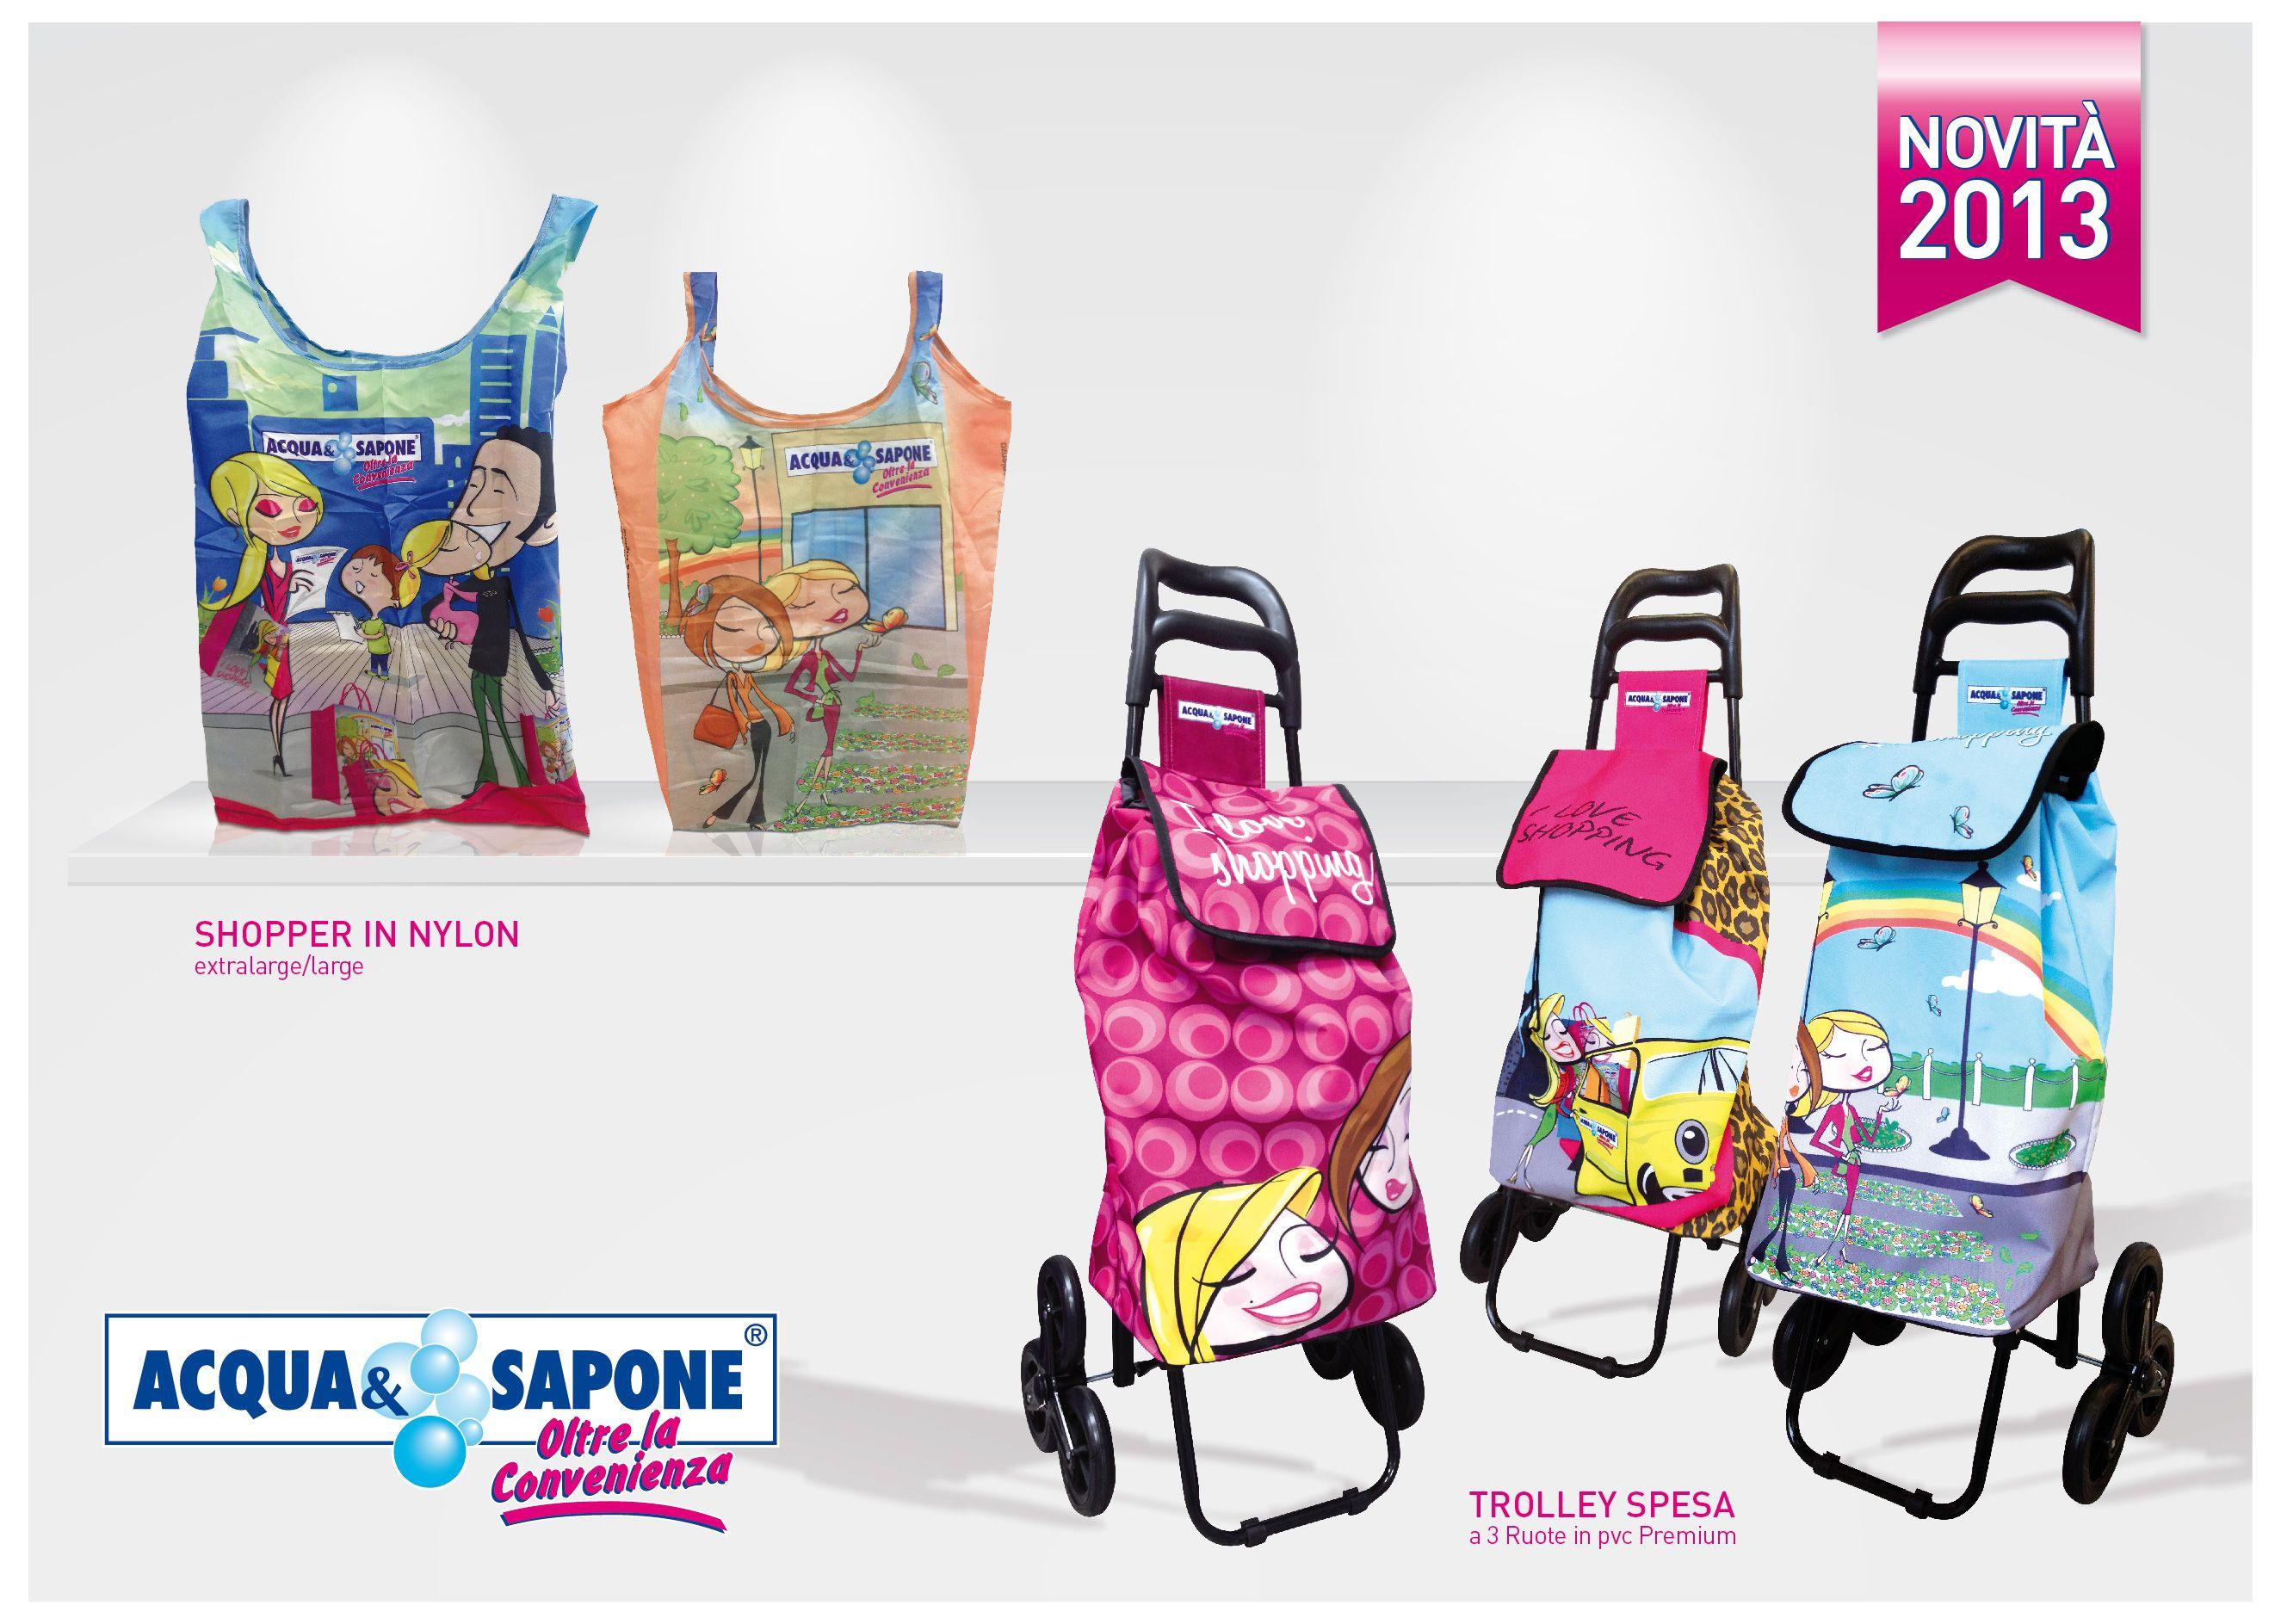 Captivating Acqua U0026 Sapone | #Shopper In Nylon E #Trolley Spesa.